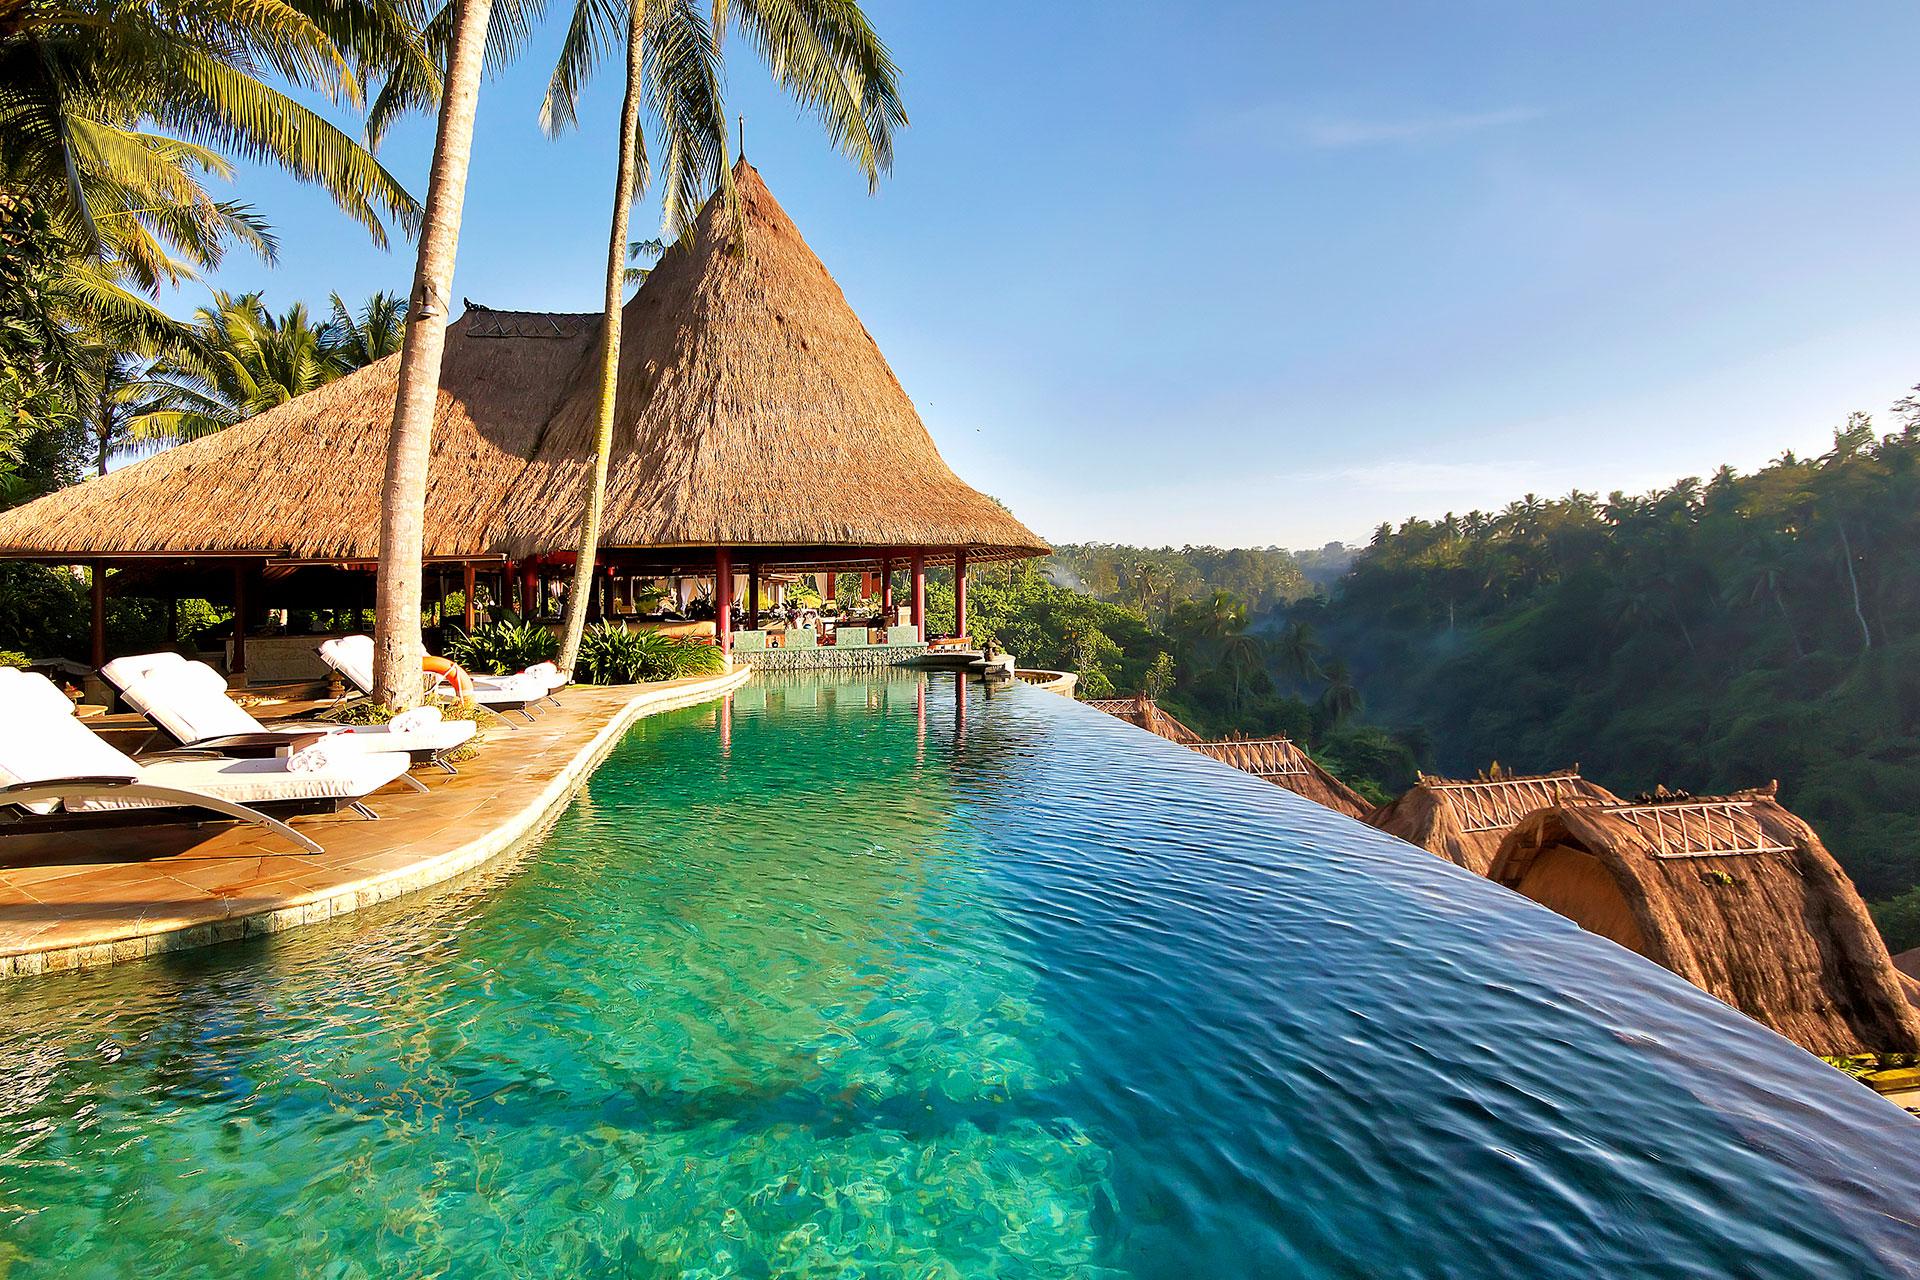 Viceroy Bali - boutique hotel in Ubud